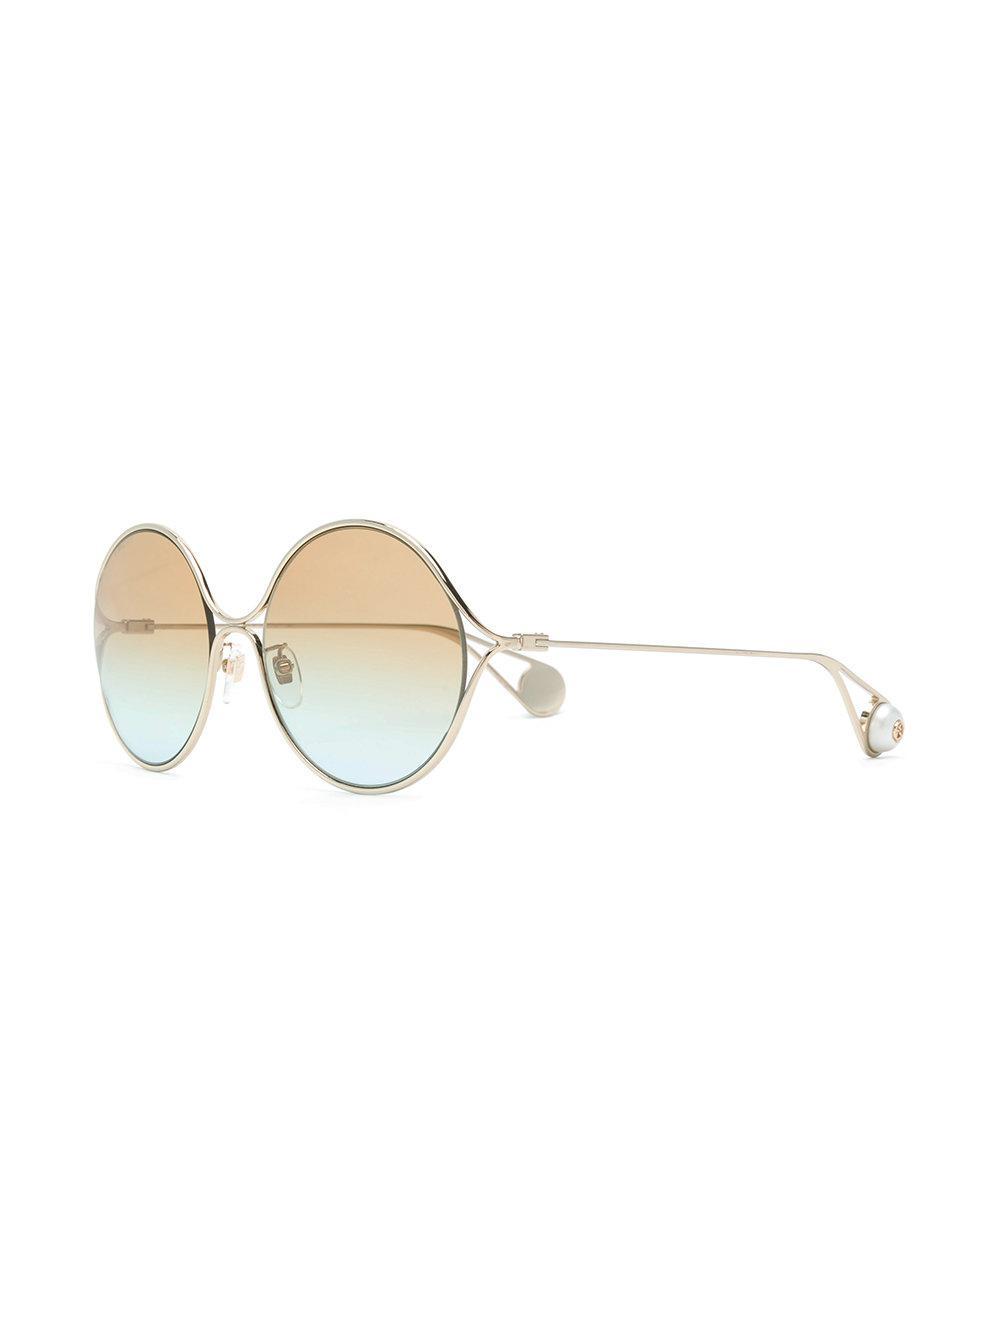 6b453c7fa12 Gucci - Metallic Round Frame Sunglasses - Lyst. View fullscreen